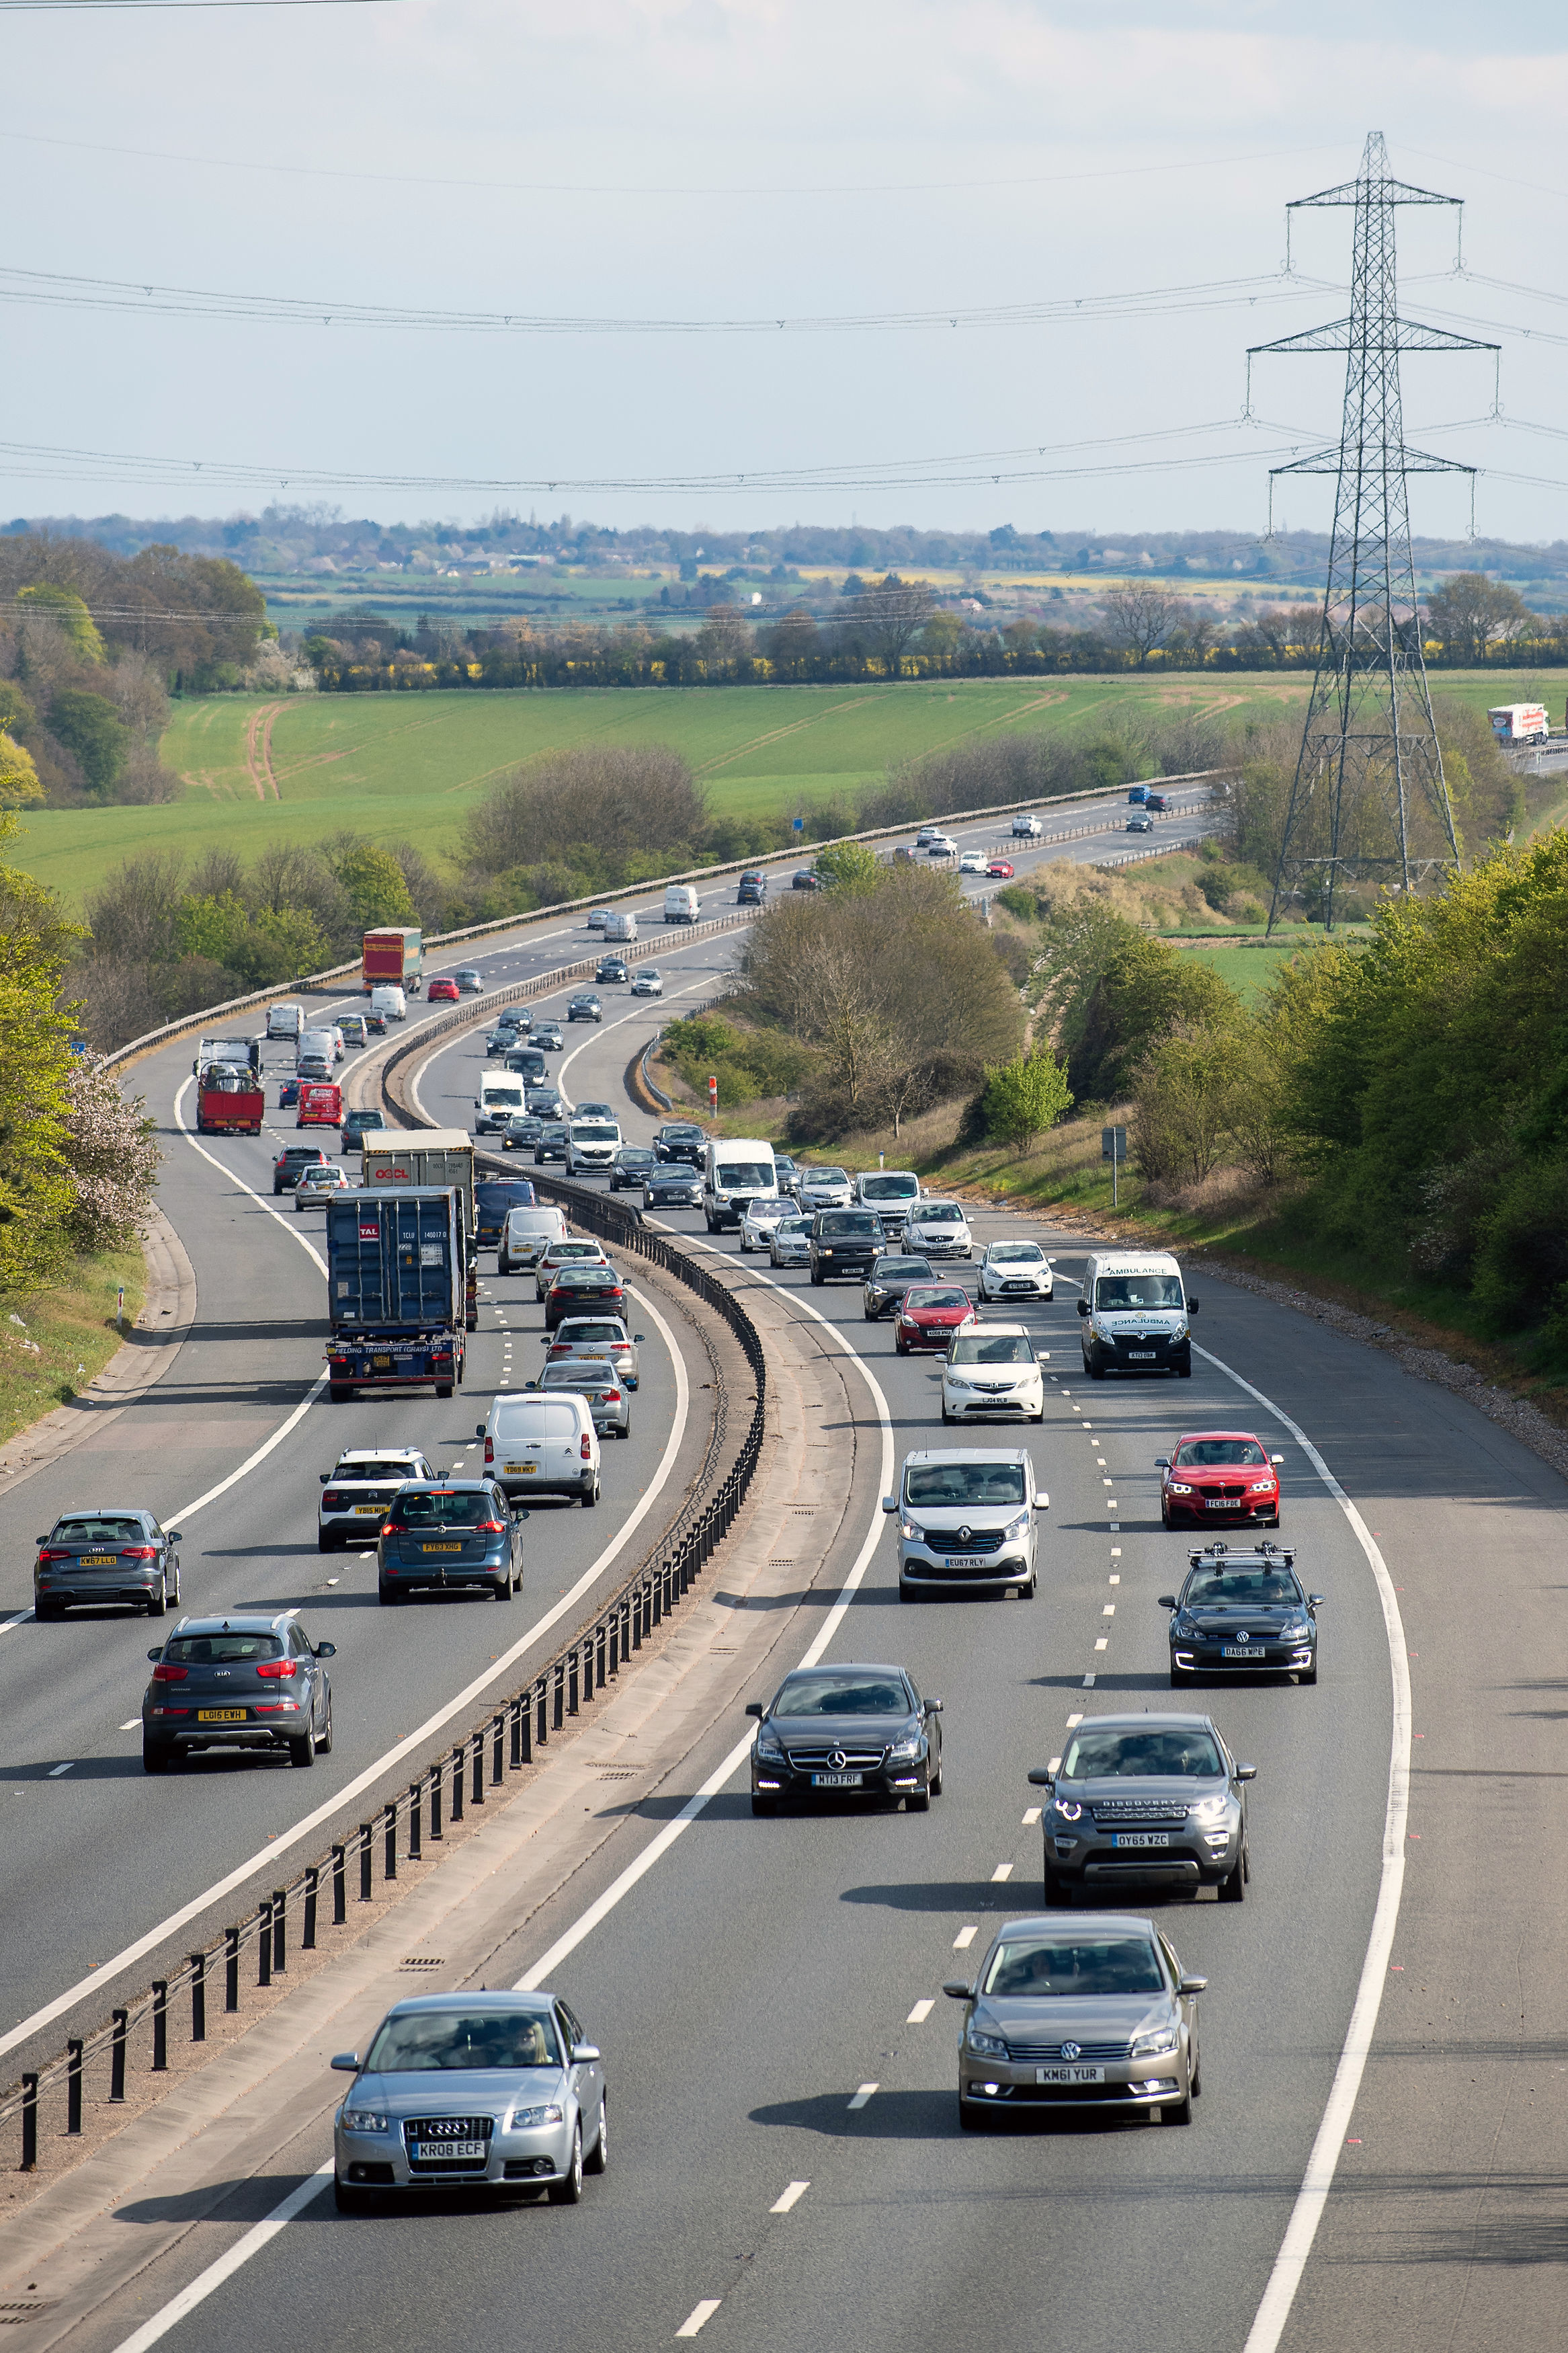 Stock image of traffic via PA